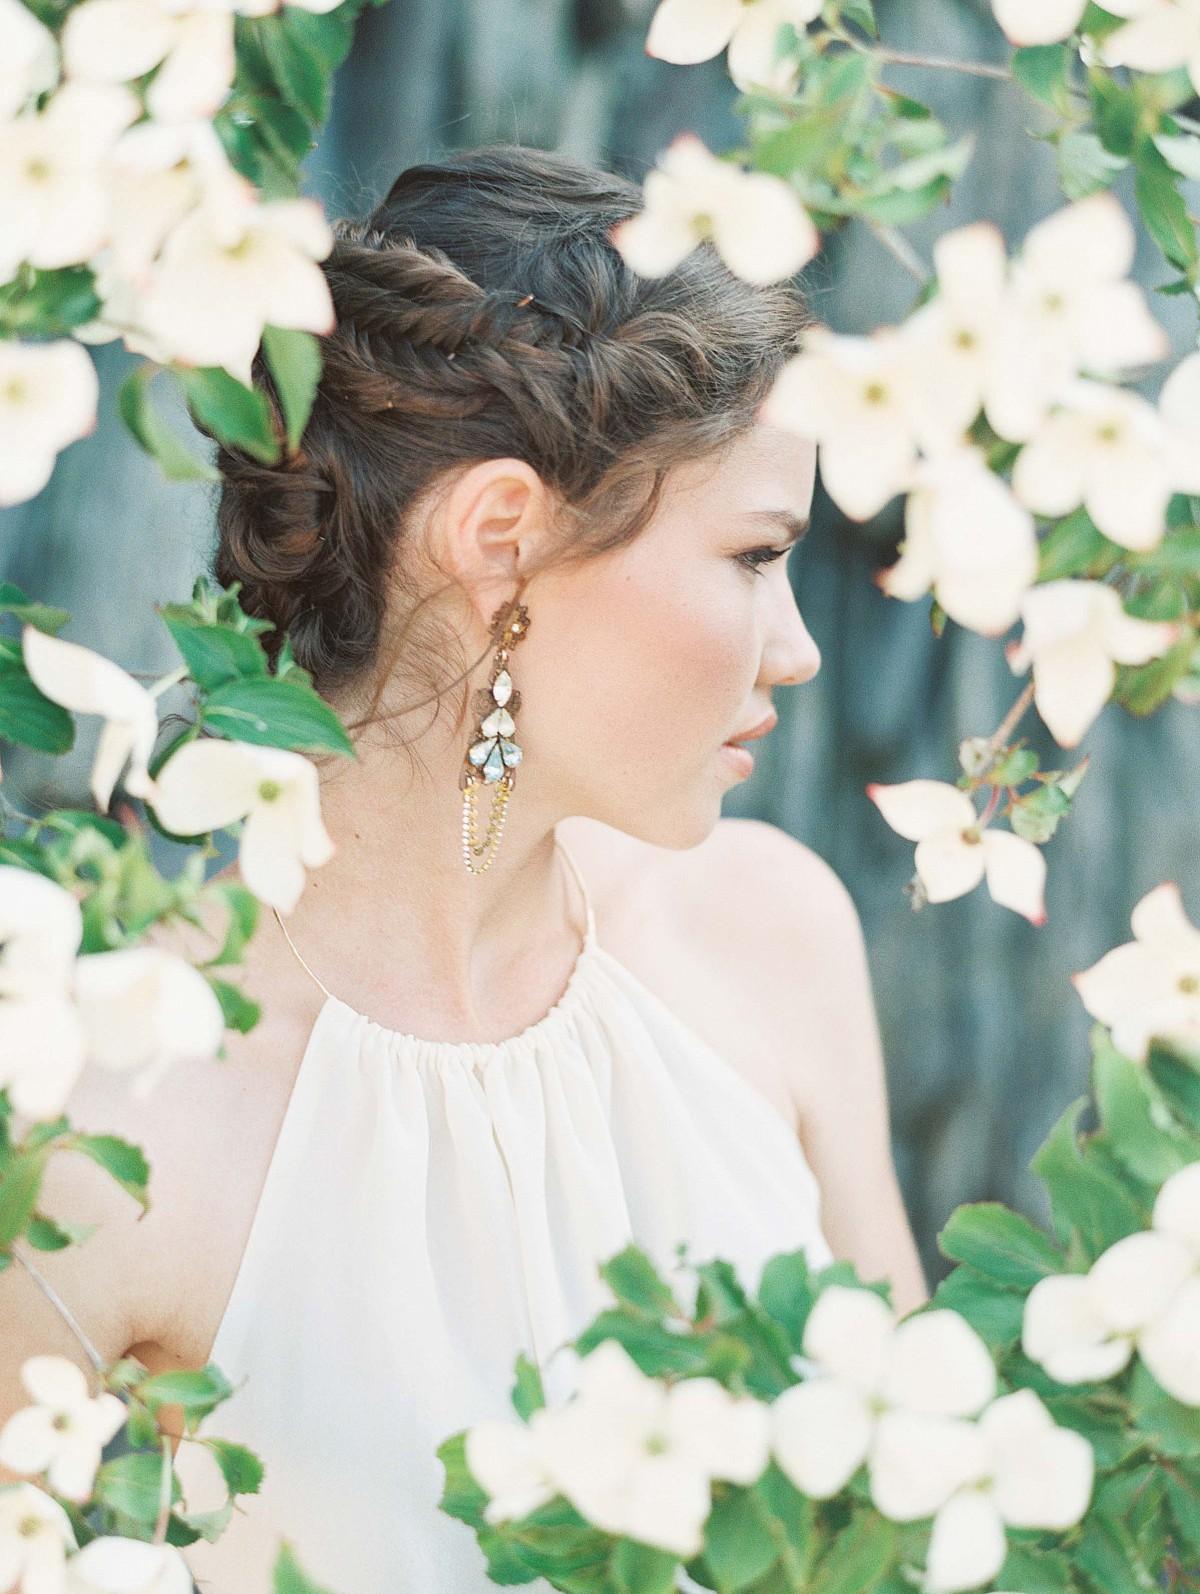 Coastal Wedding Inspiration - D'Arcy Benincosa